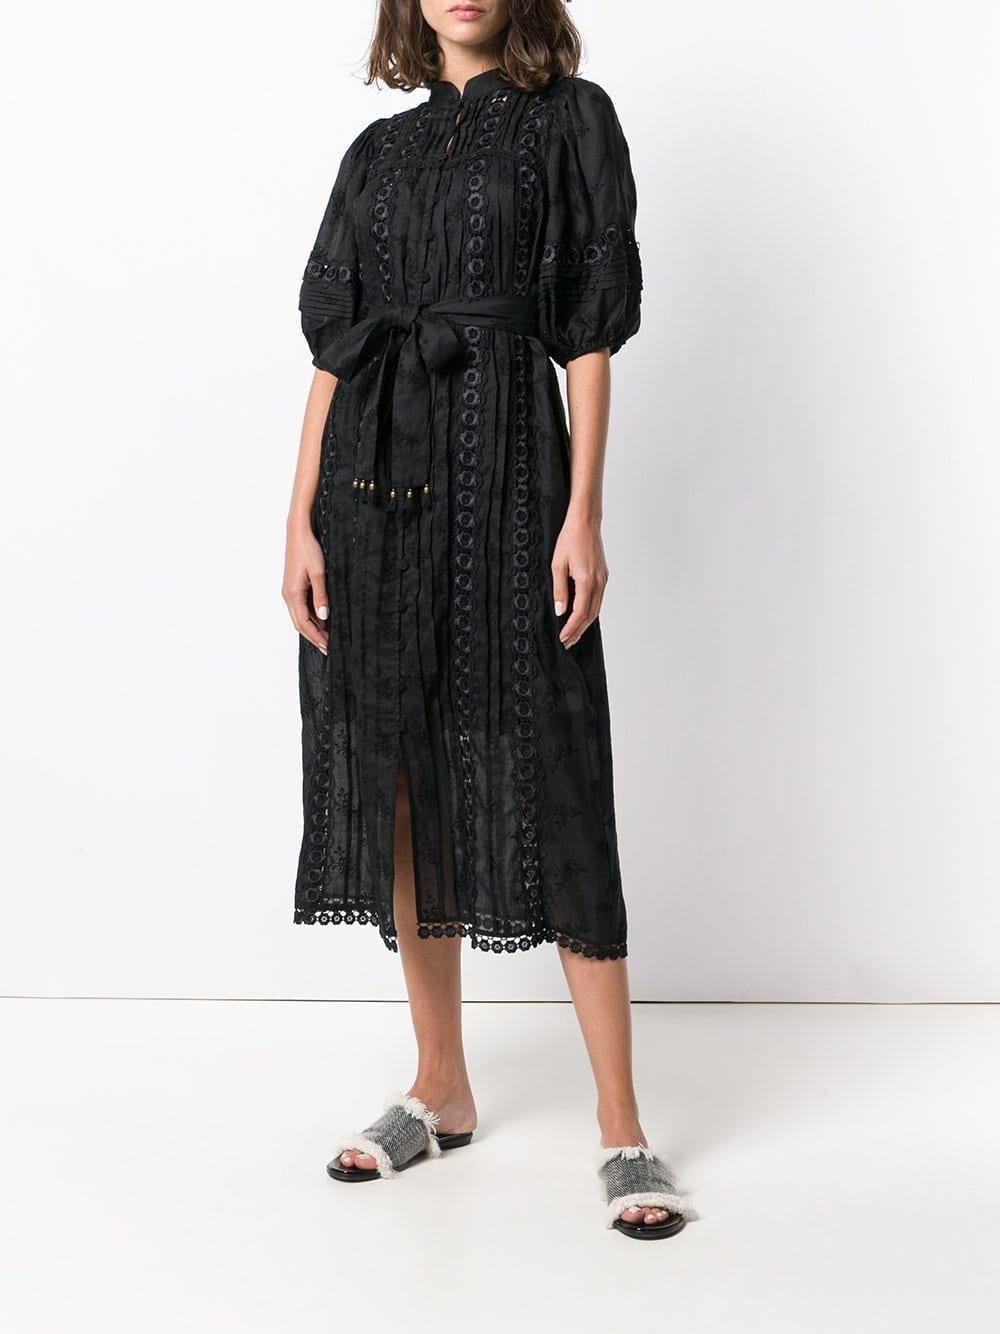 ZIMMERMANN Embroidered Belted Black Dress